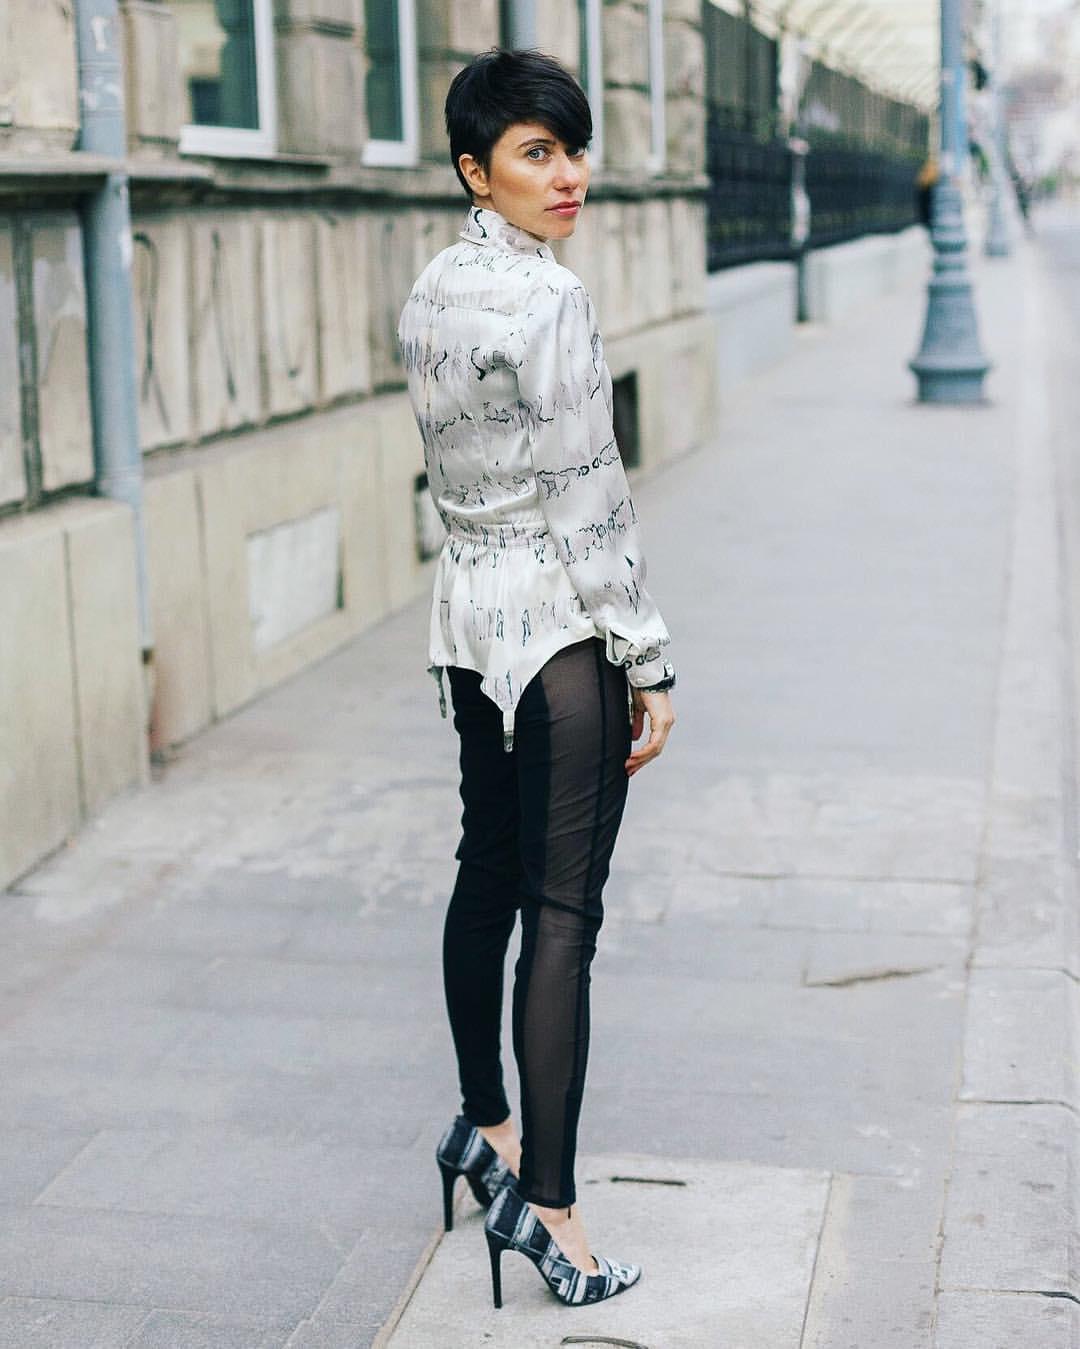 eduard-mariut-on-the-street-moody-roza-fashion-bucharest